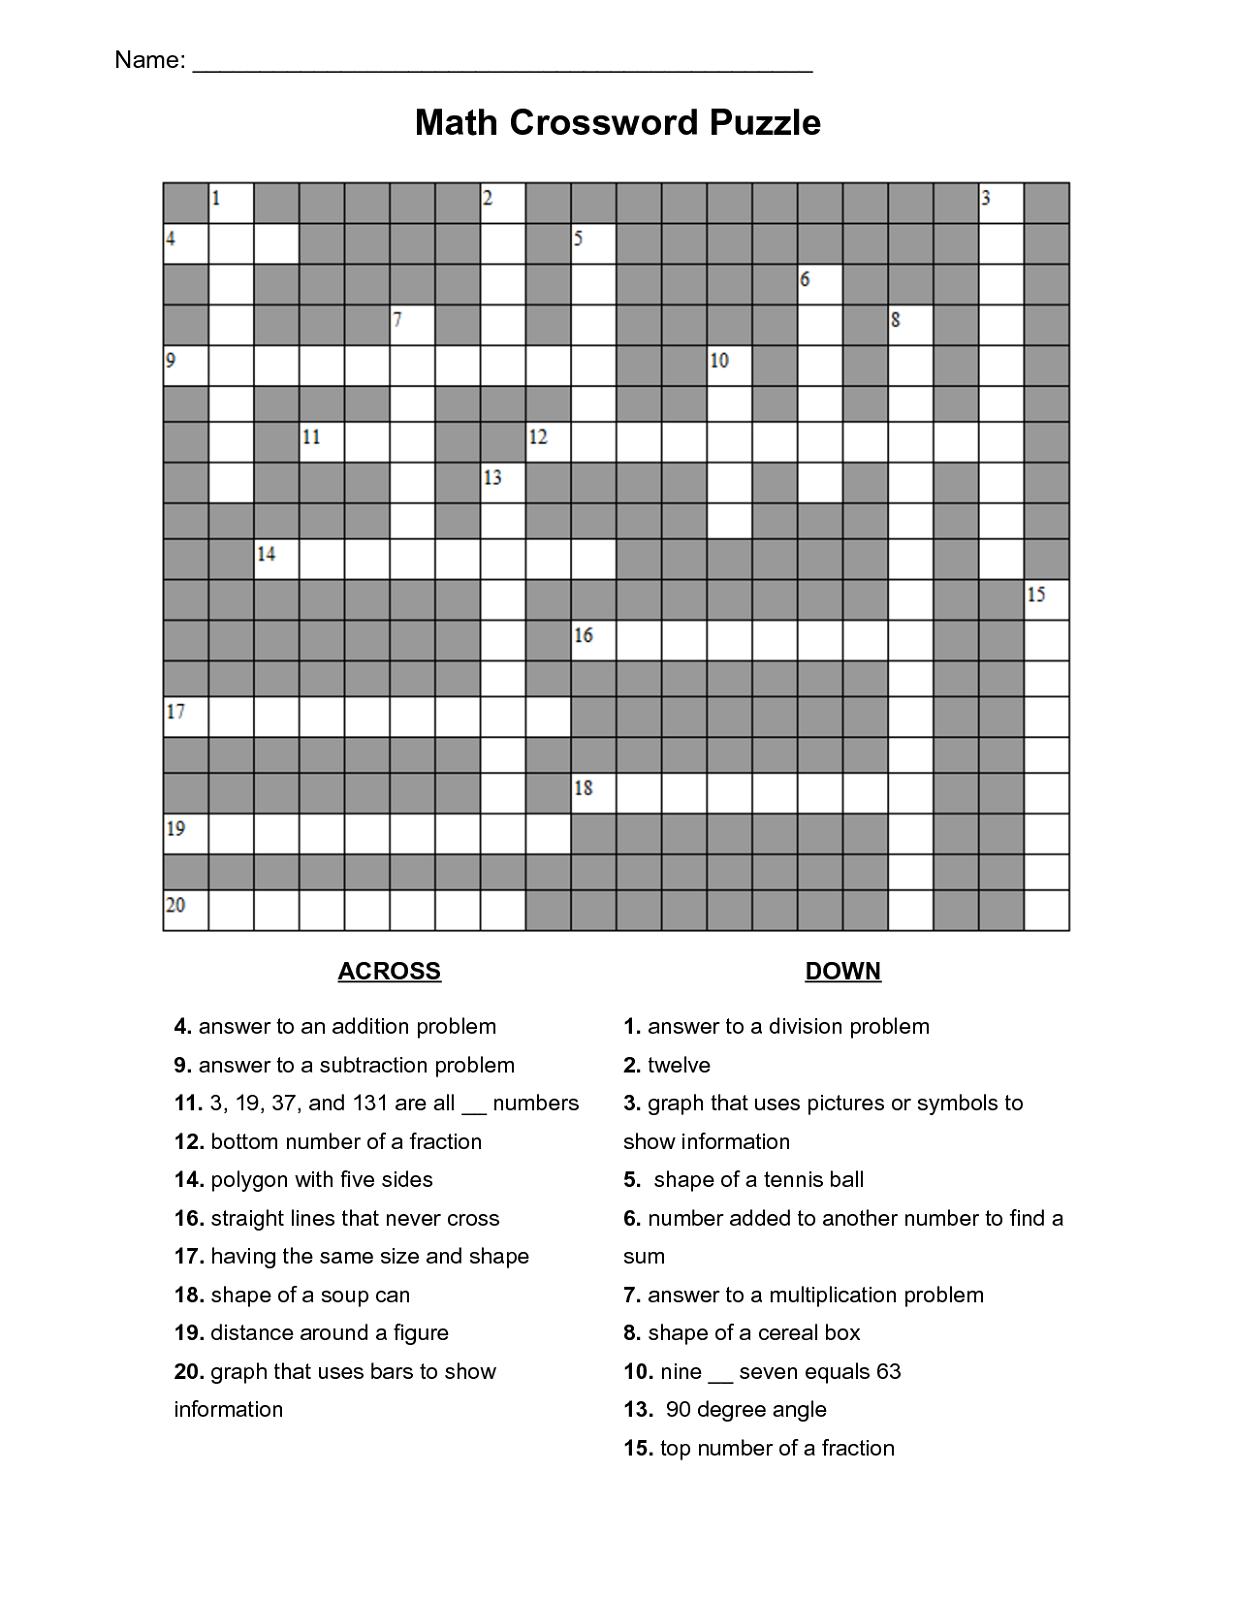 math puzzles printable crossword